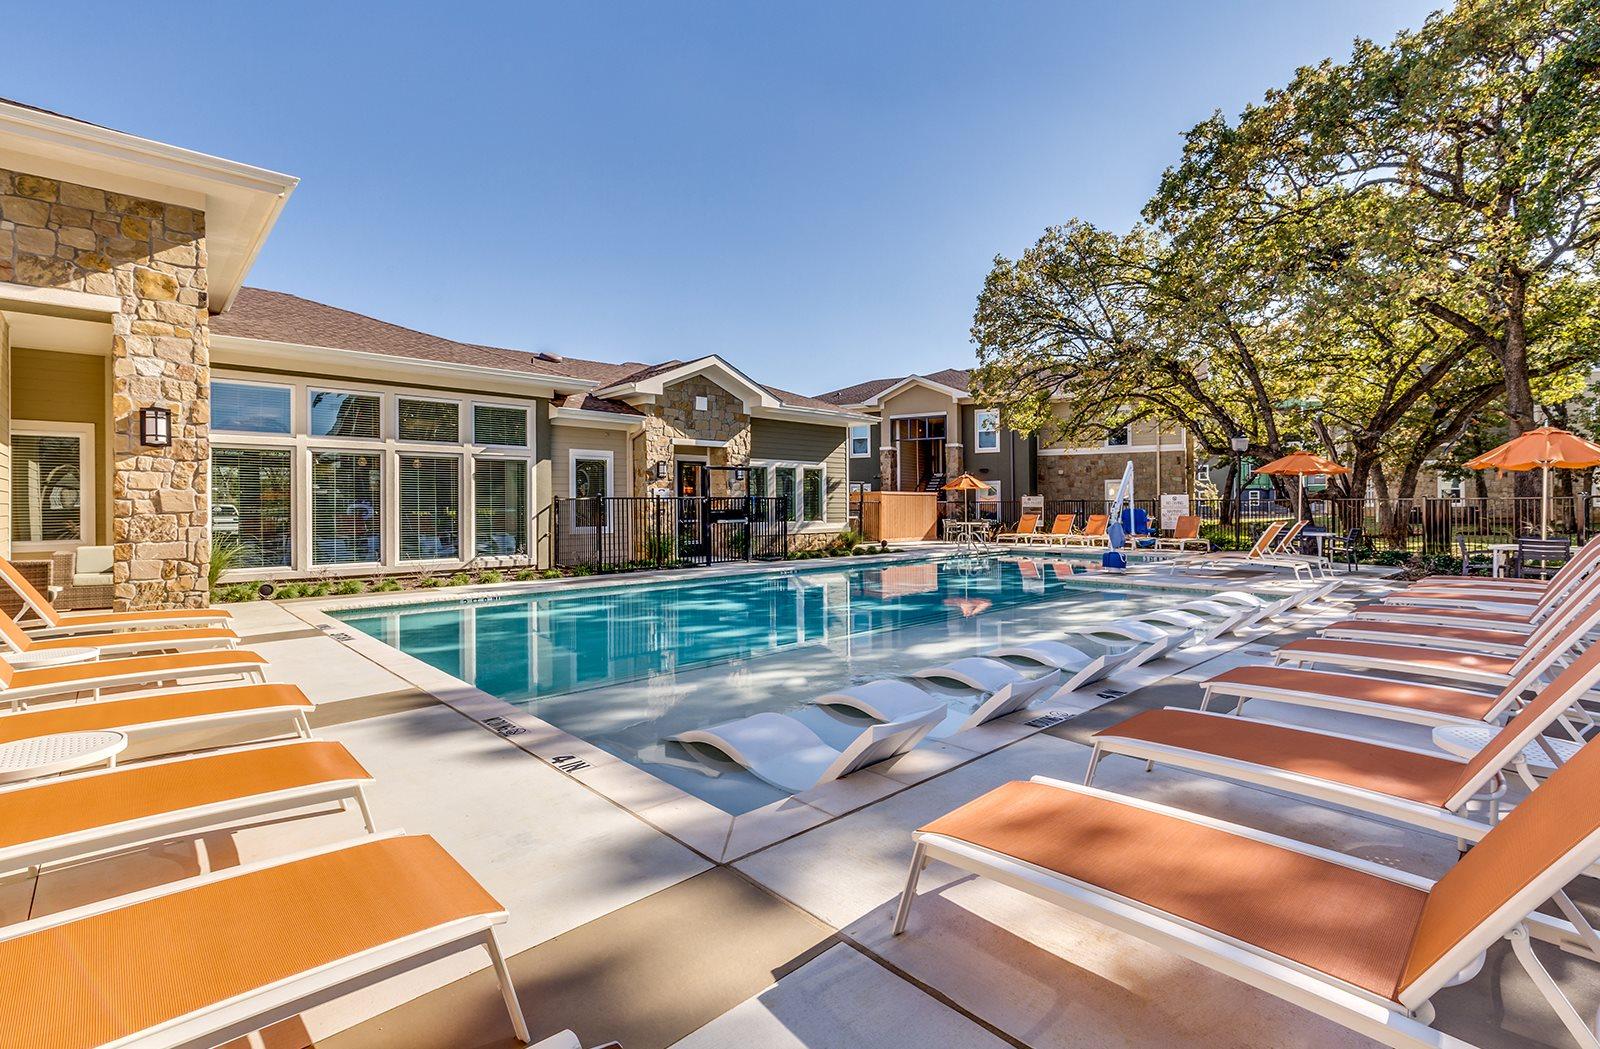 Sparkling Swimming Pool with Grill at The Veranda, Denton, TX